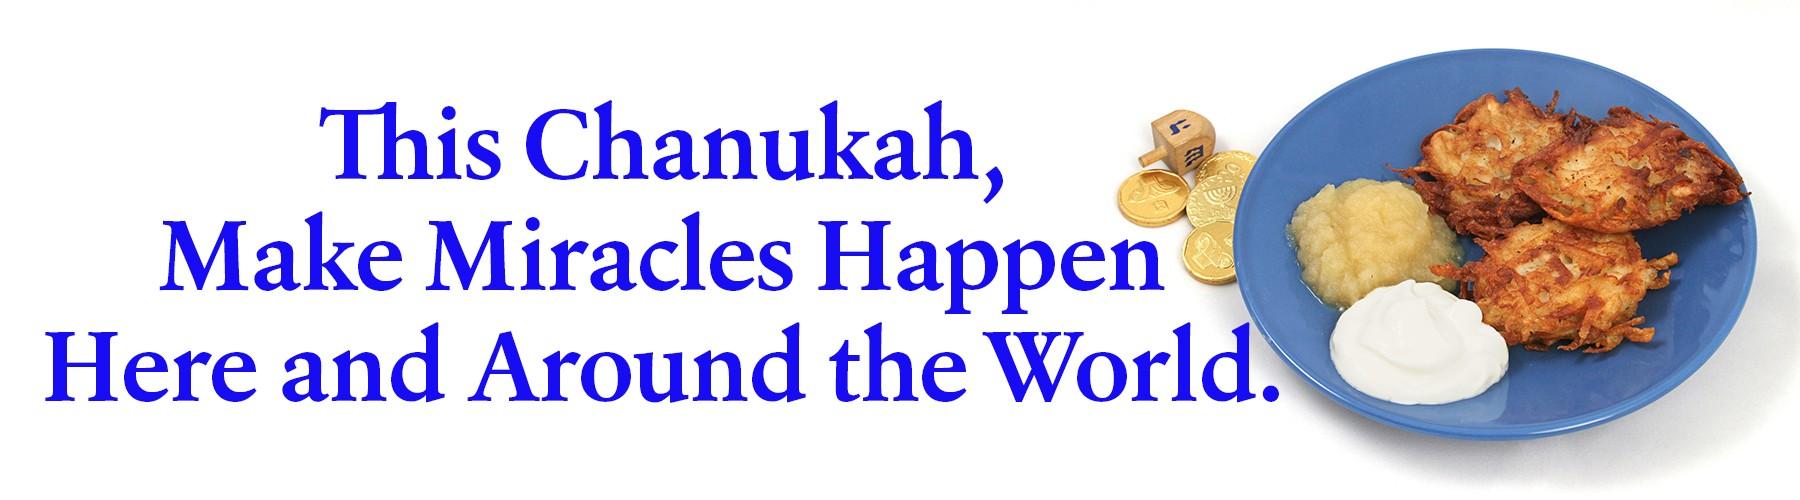 Chanukah 2015 5776 banner.jpg